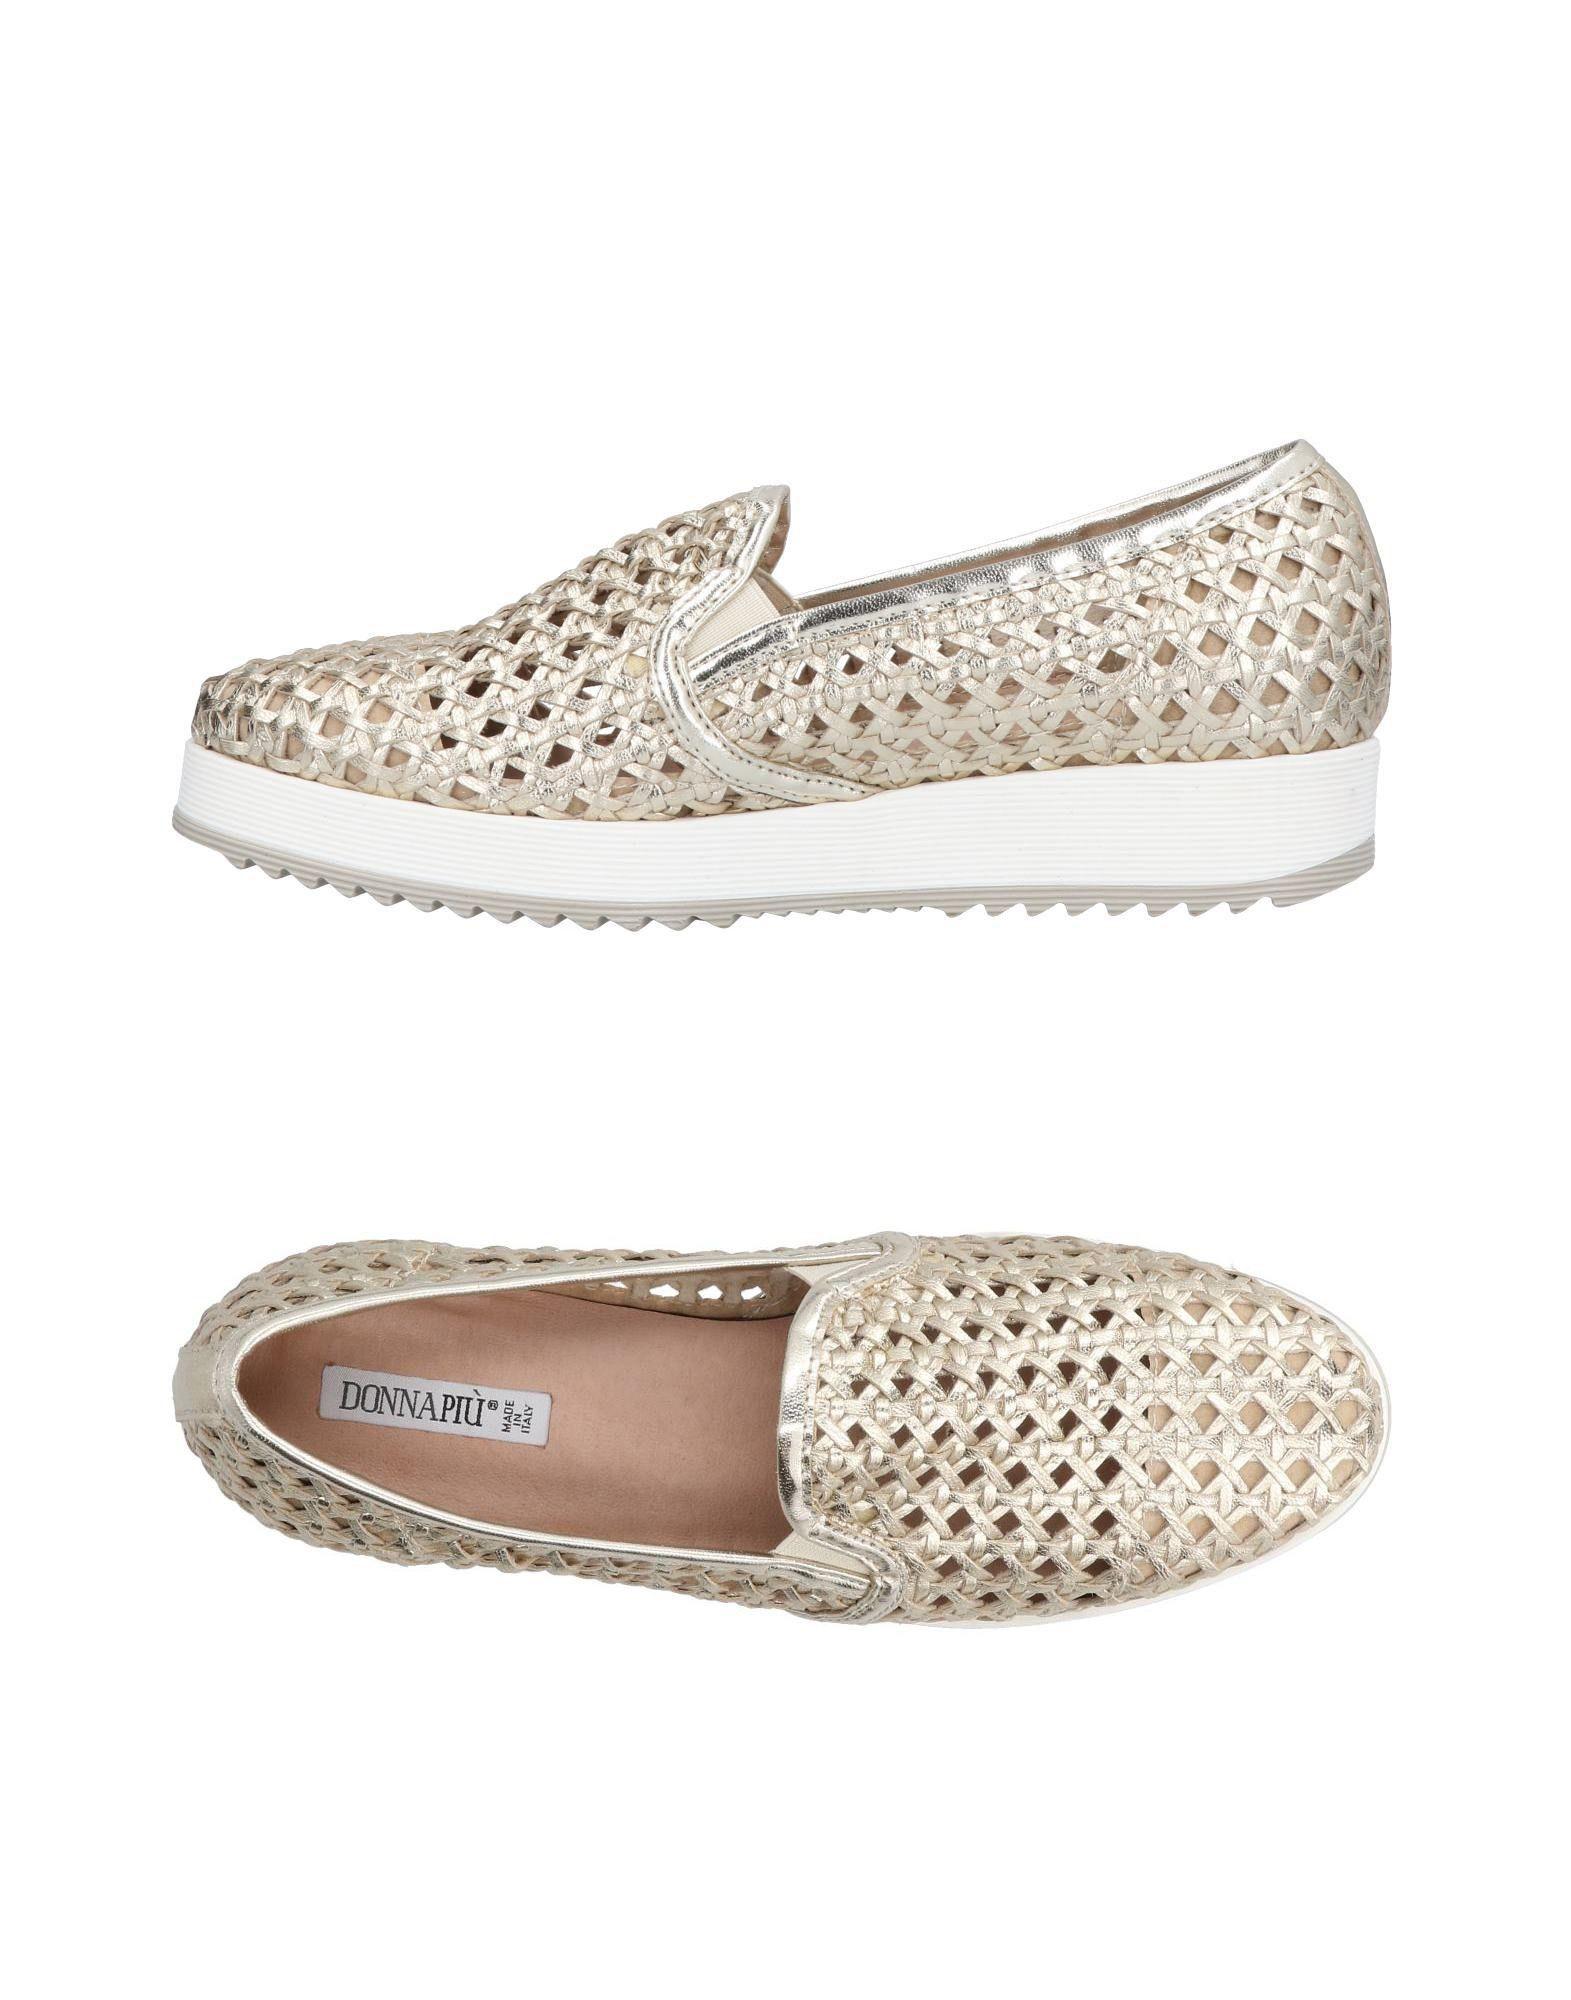 Donna Più Sneakers Damen  11464876RO Gute Qualität beliebte Schuhe